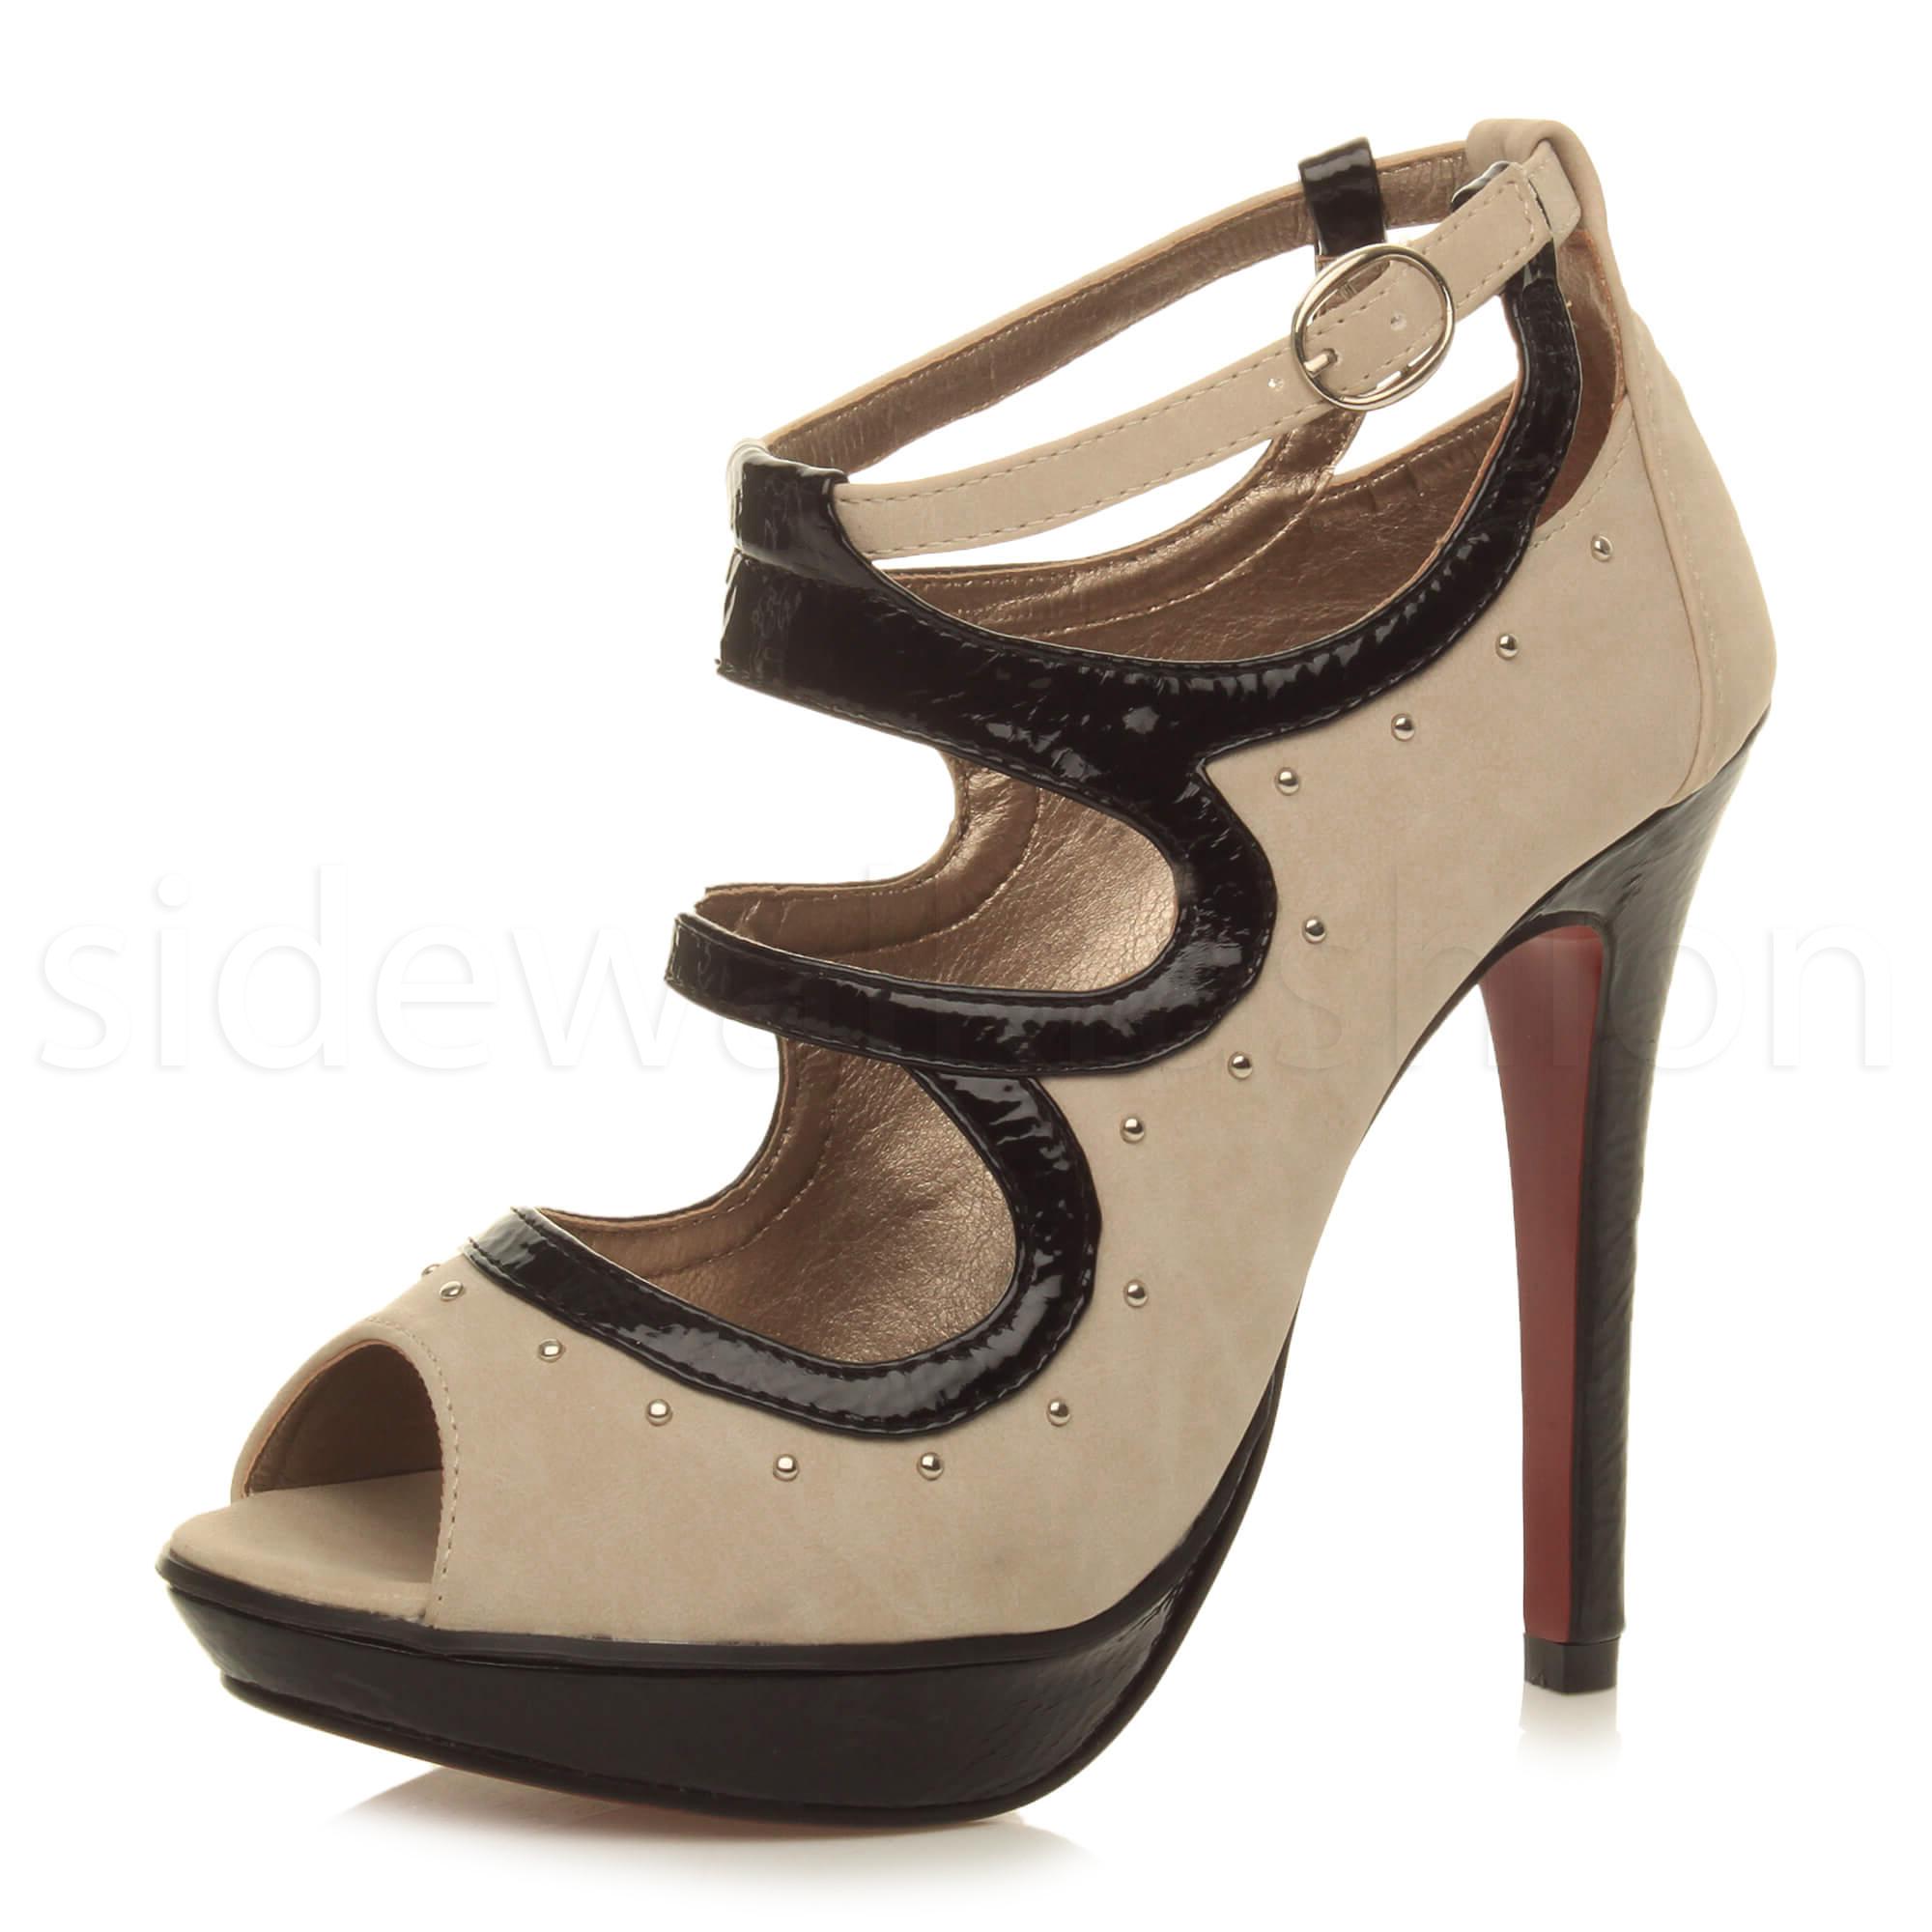 745932bb77f Womens ladies high heel platform studded cut out sandals peep toe ...